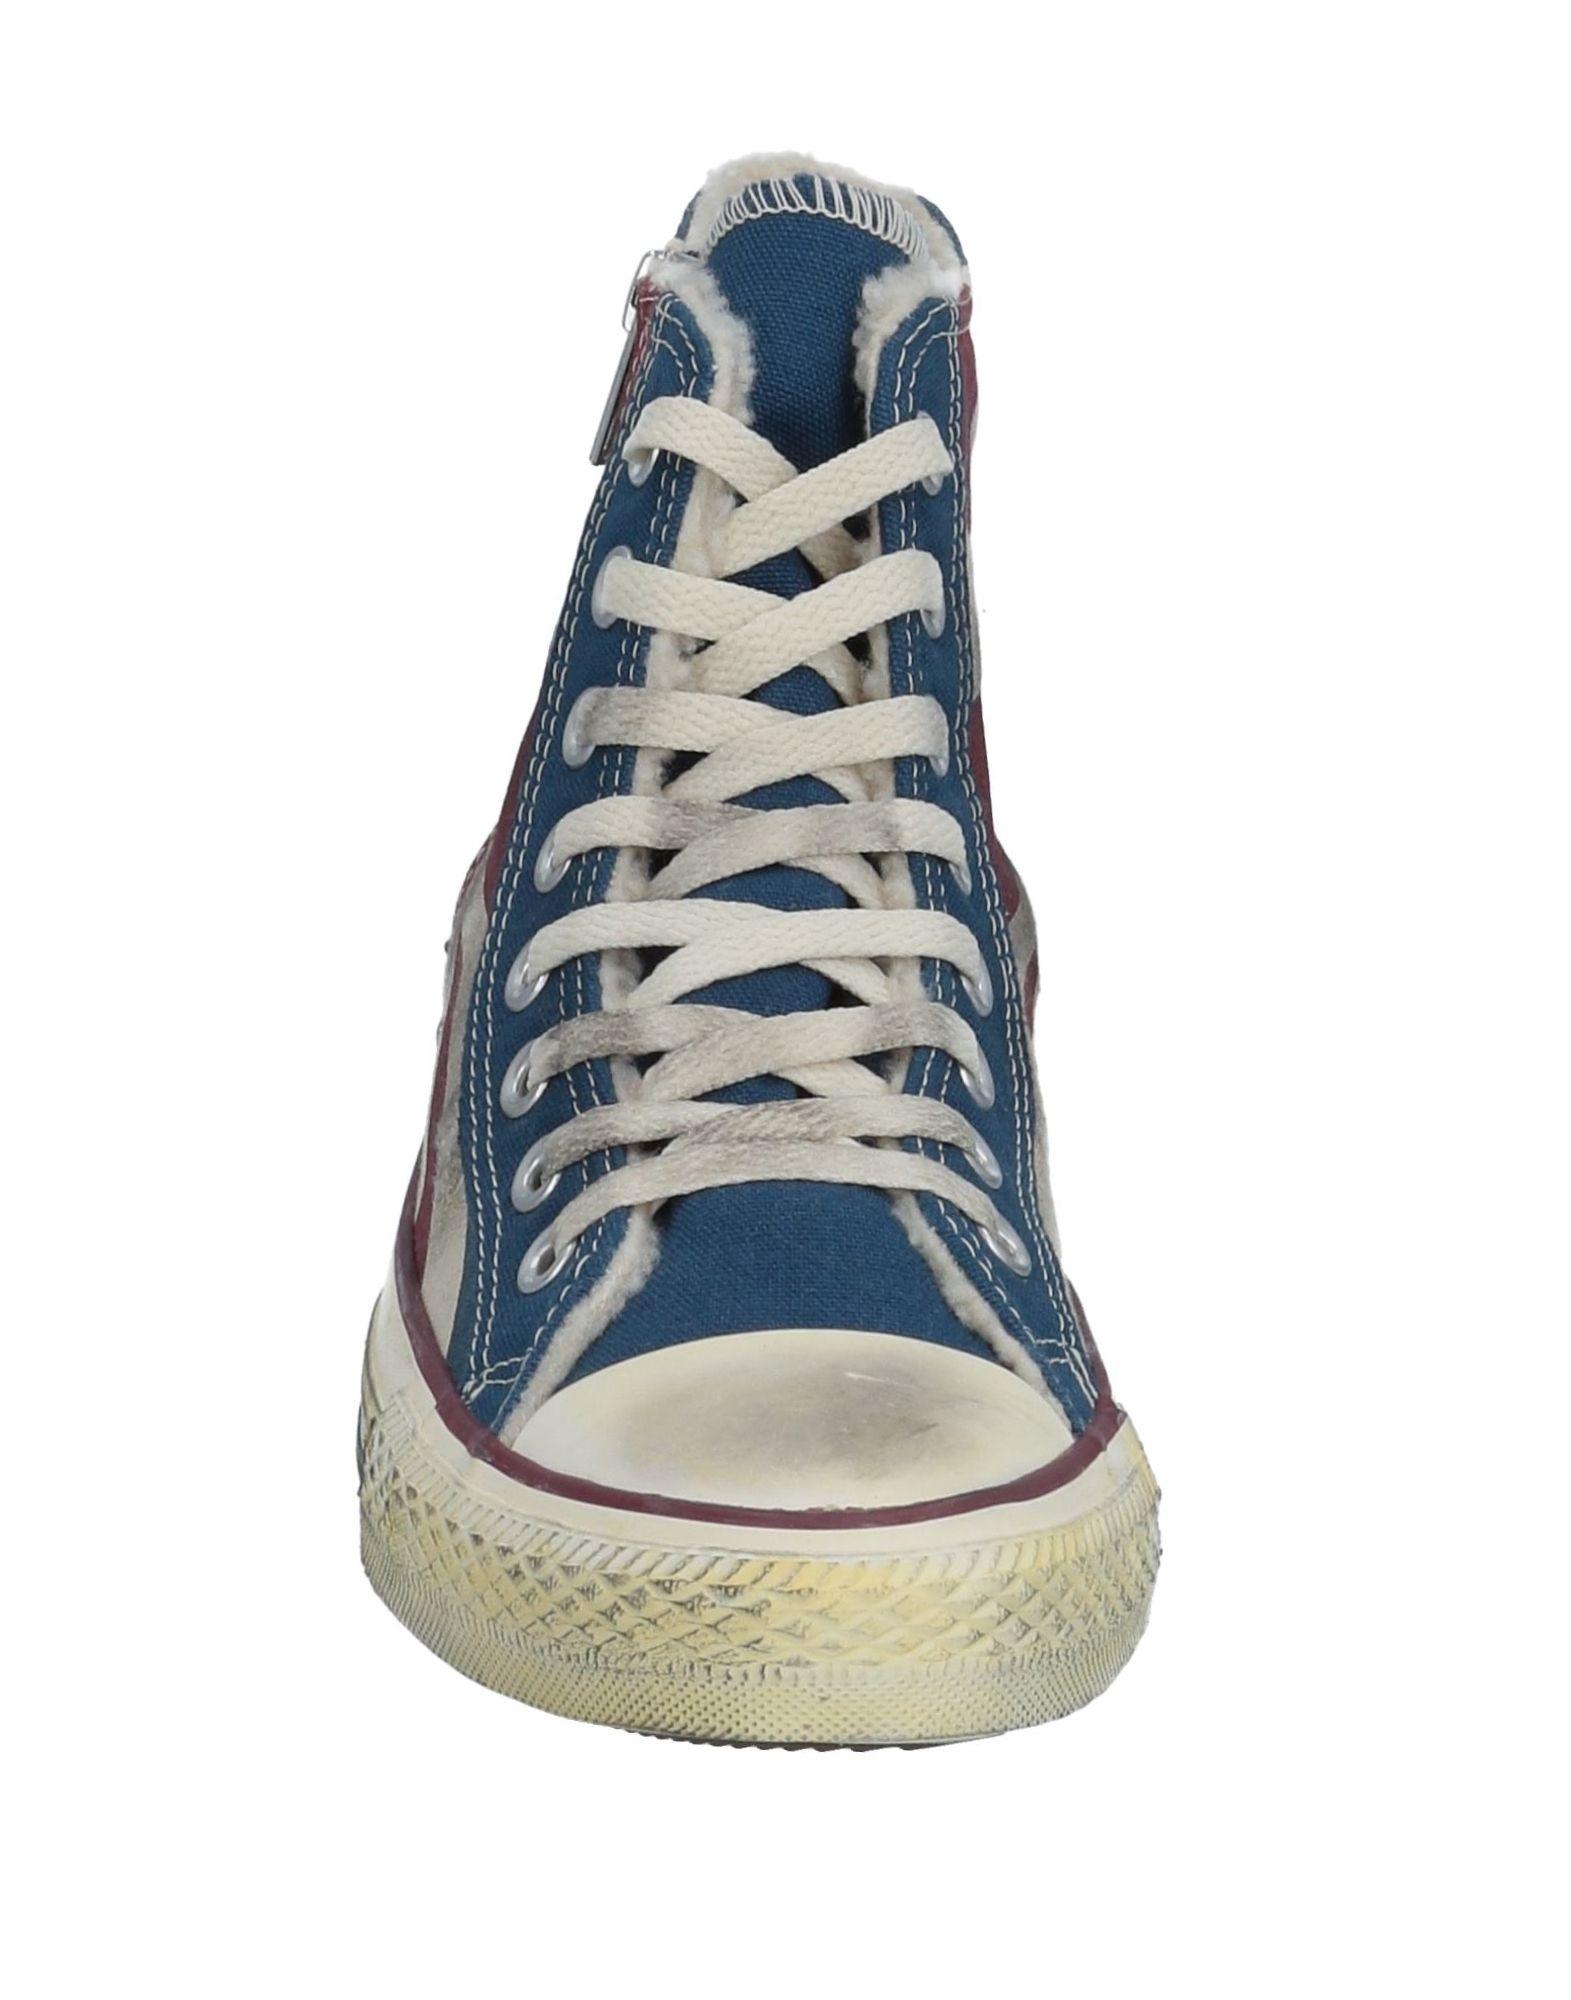 Rabatt echte Schuhe Herren Converse All Star Sneakers Herren Schuhe  11522708PU 20c6b3